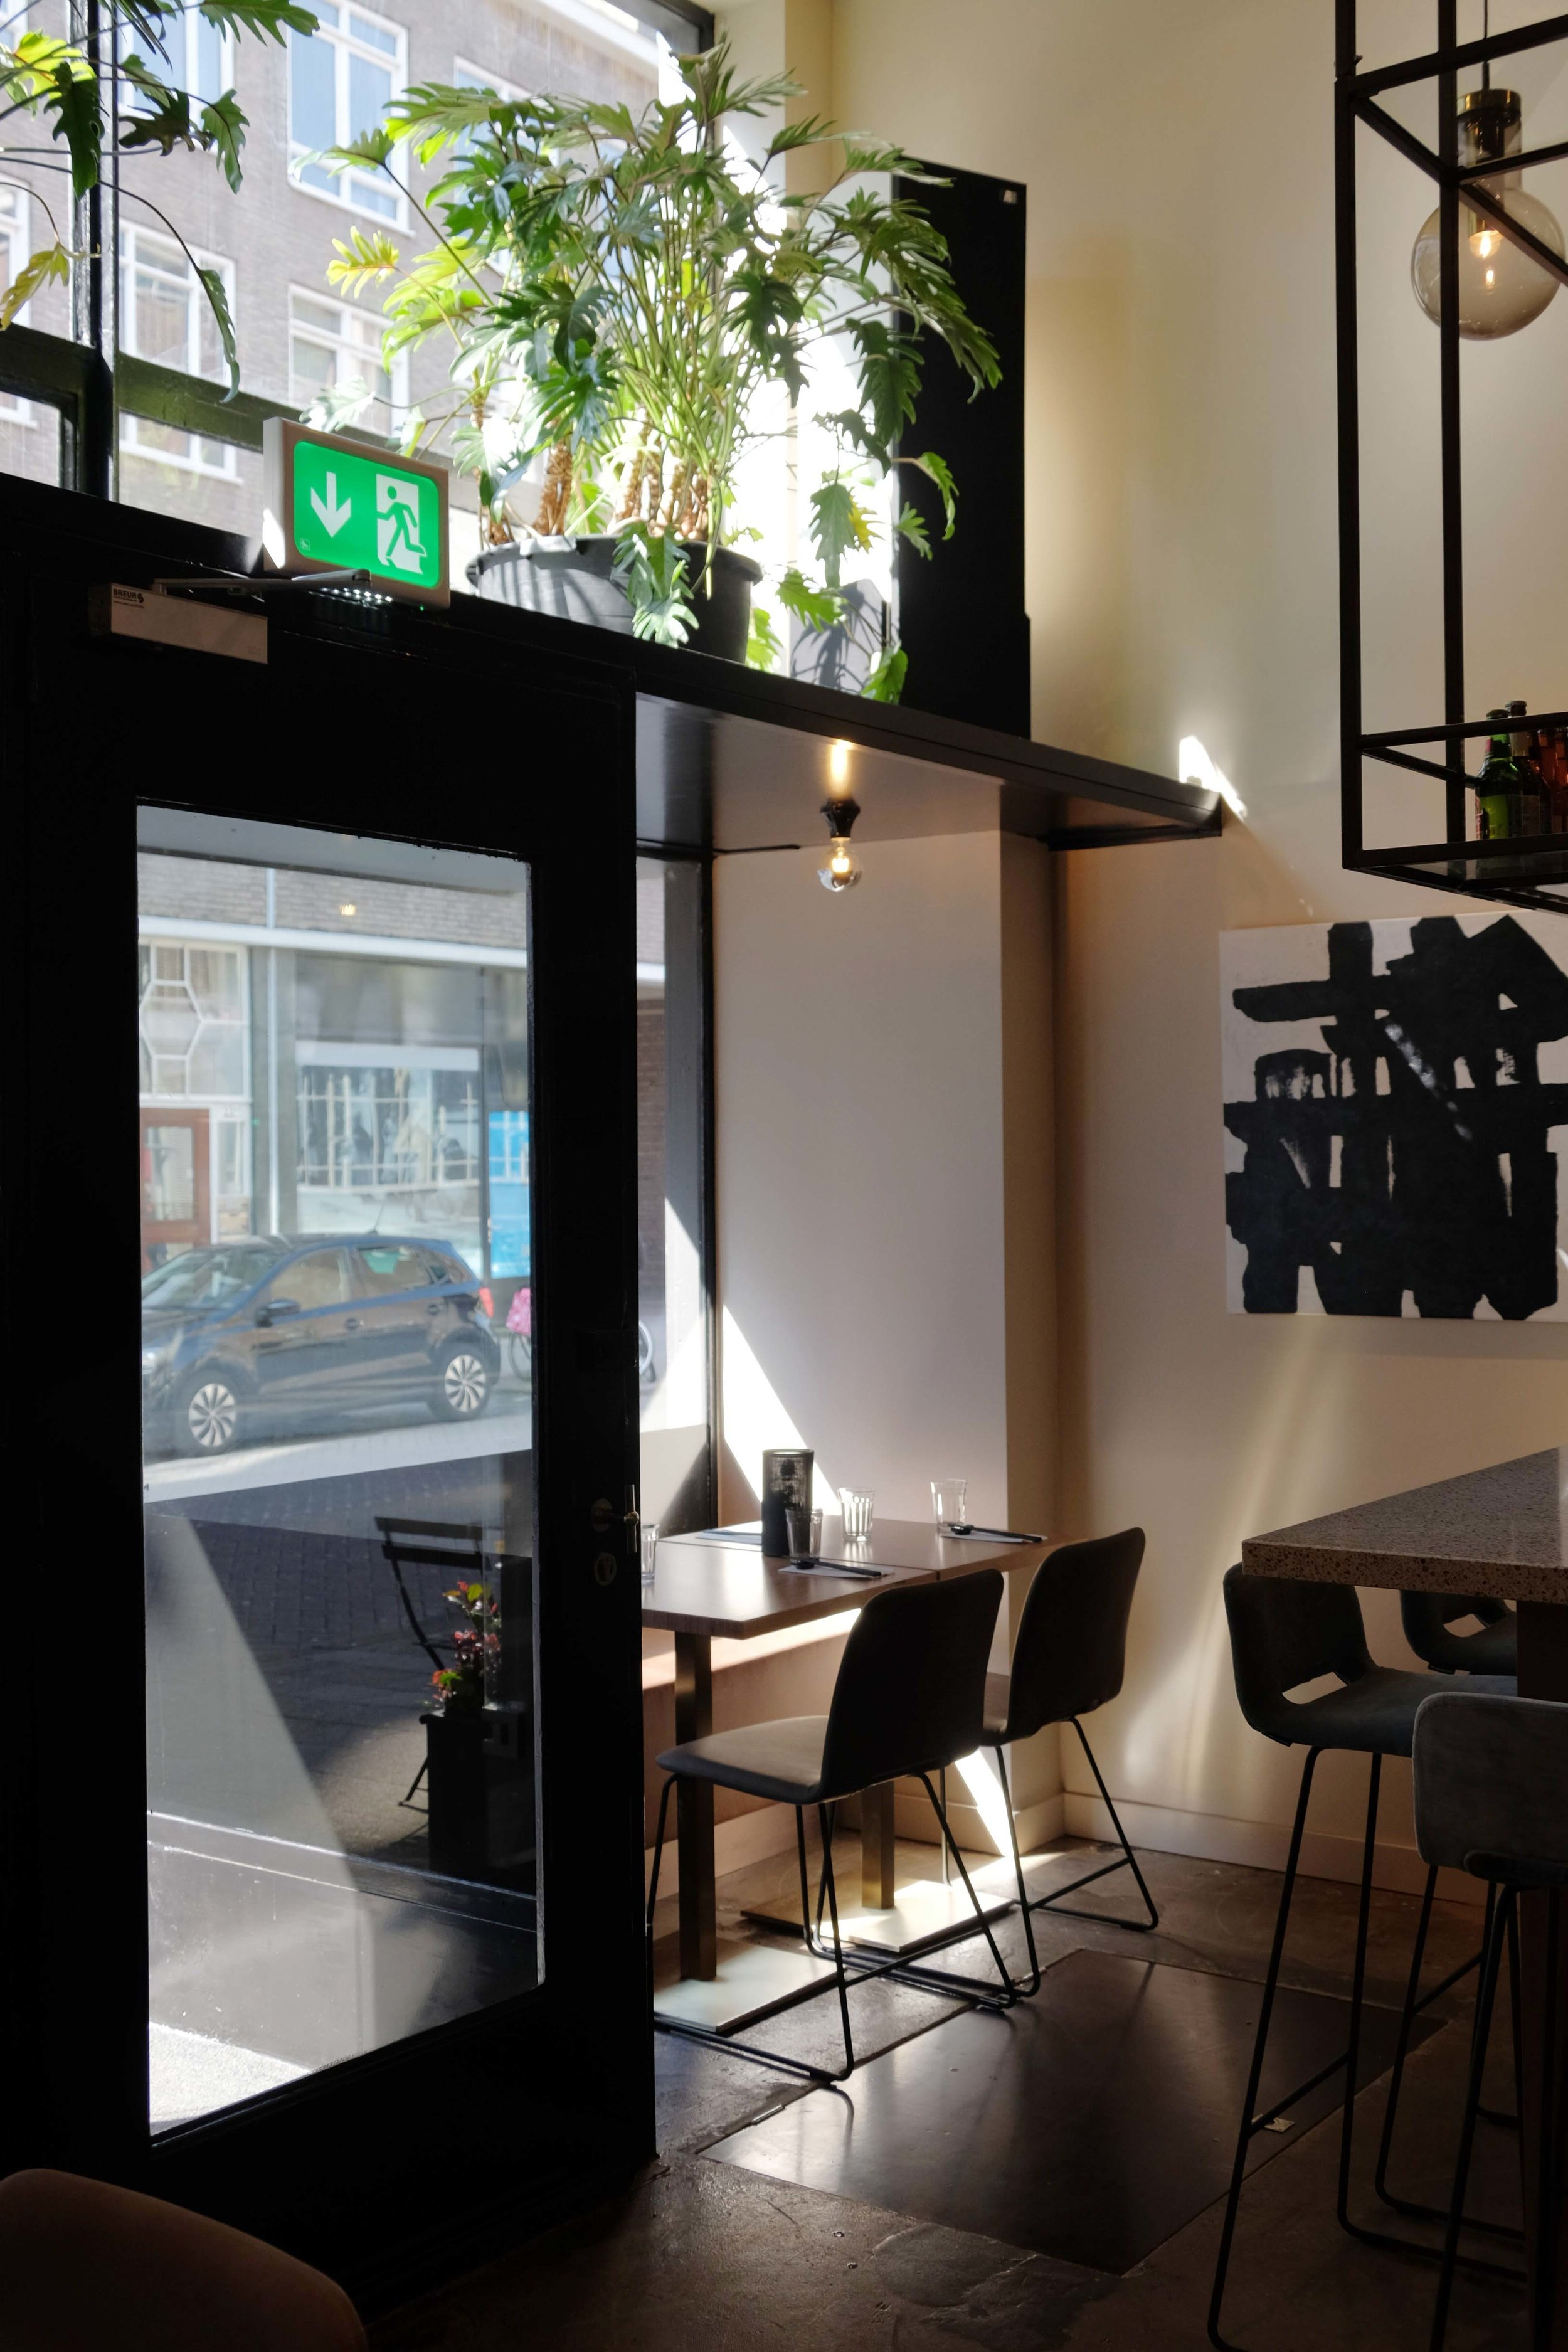 Restaurant Nooch Rotterdam westewagenstraat 56 lex de gooijer interiors 009.jpg